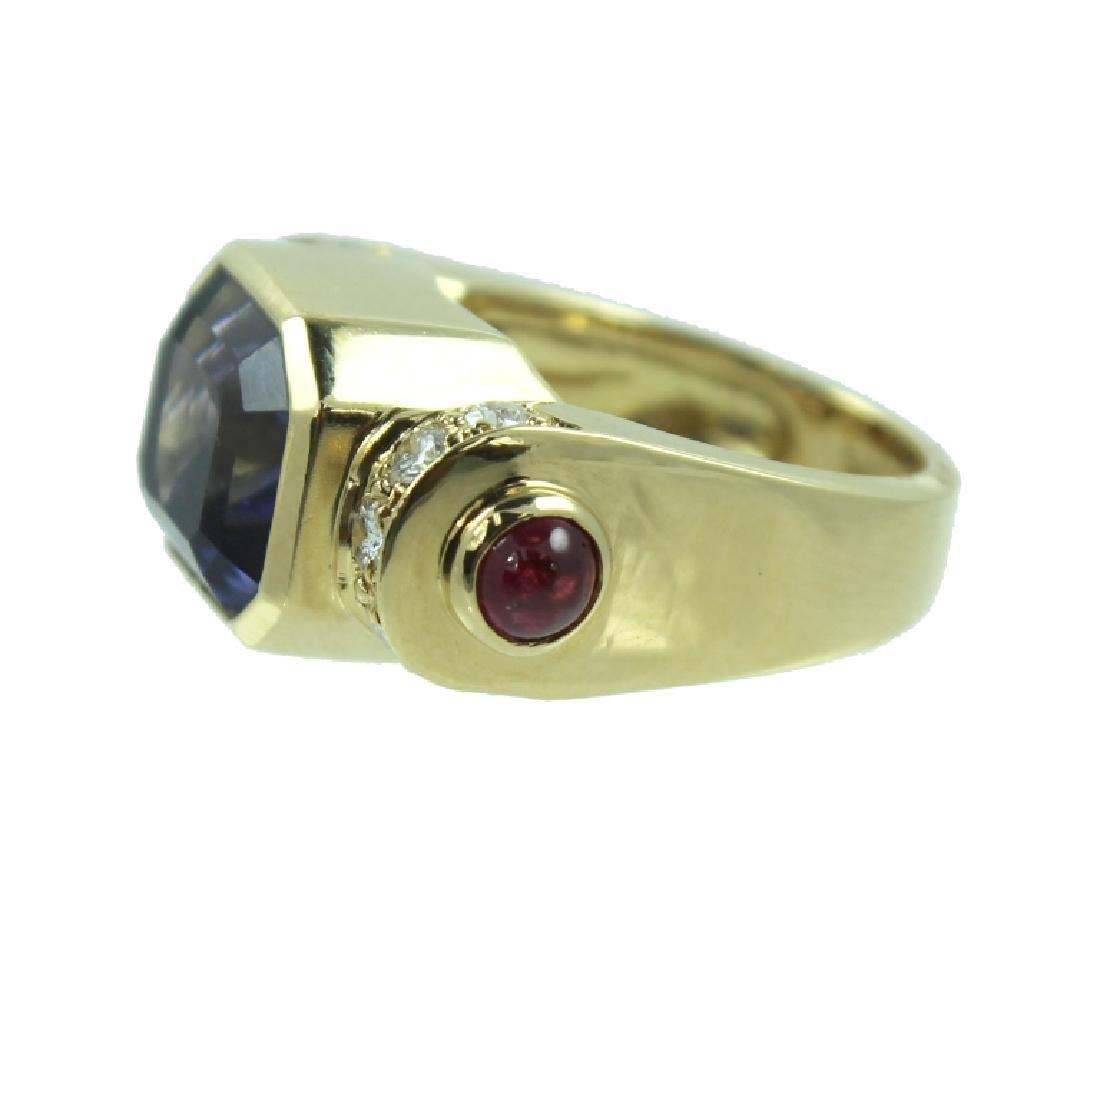 ESTATE LOLITE RUBY & DIAMOND RING - 3